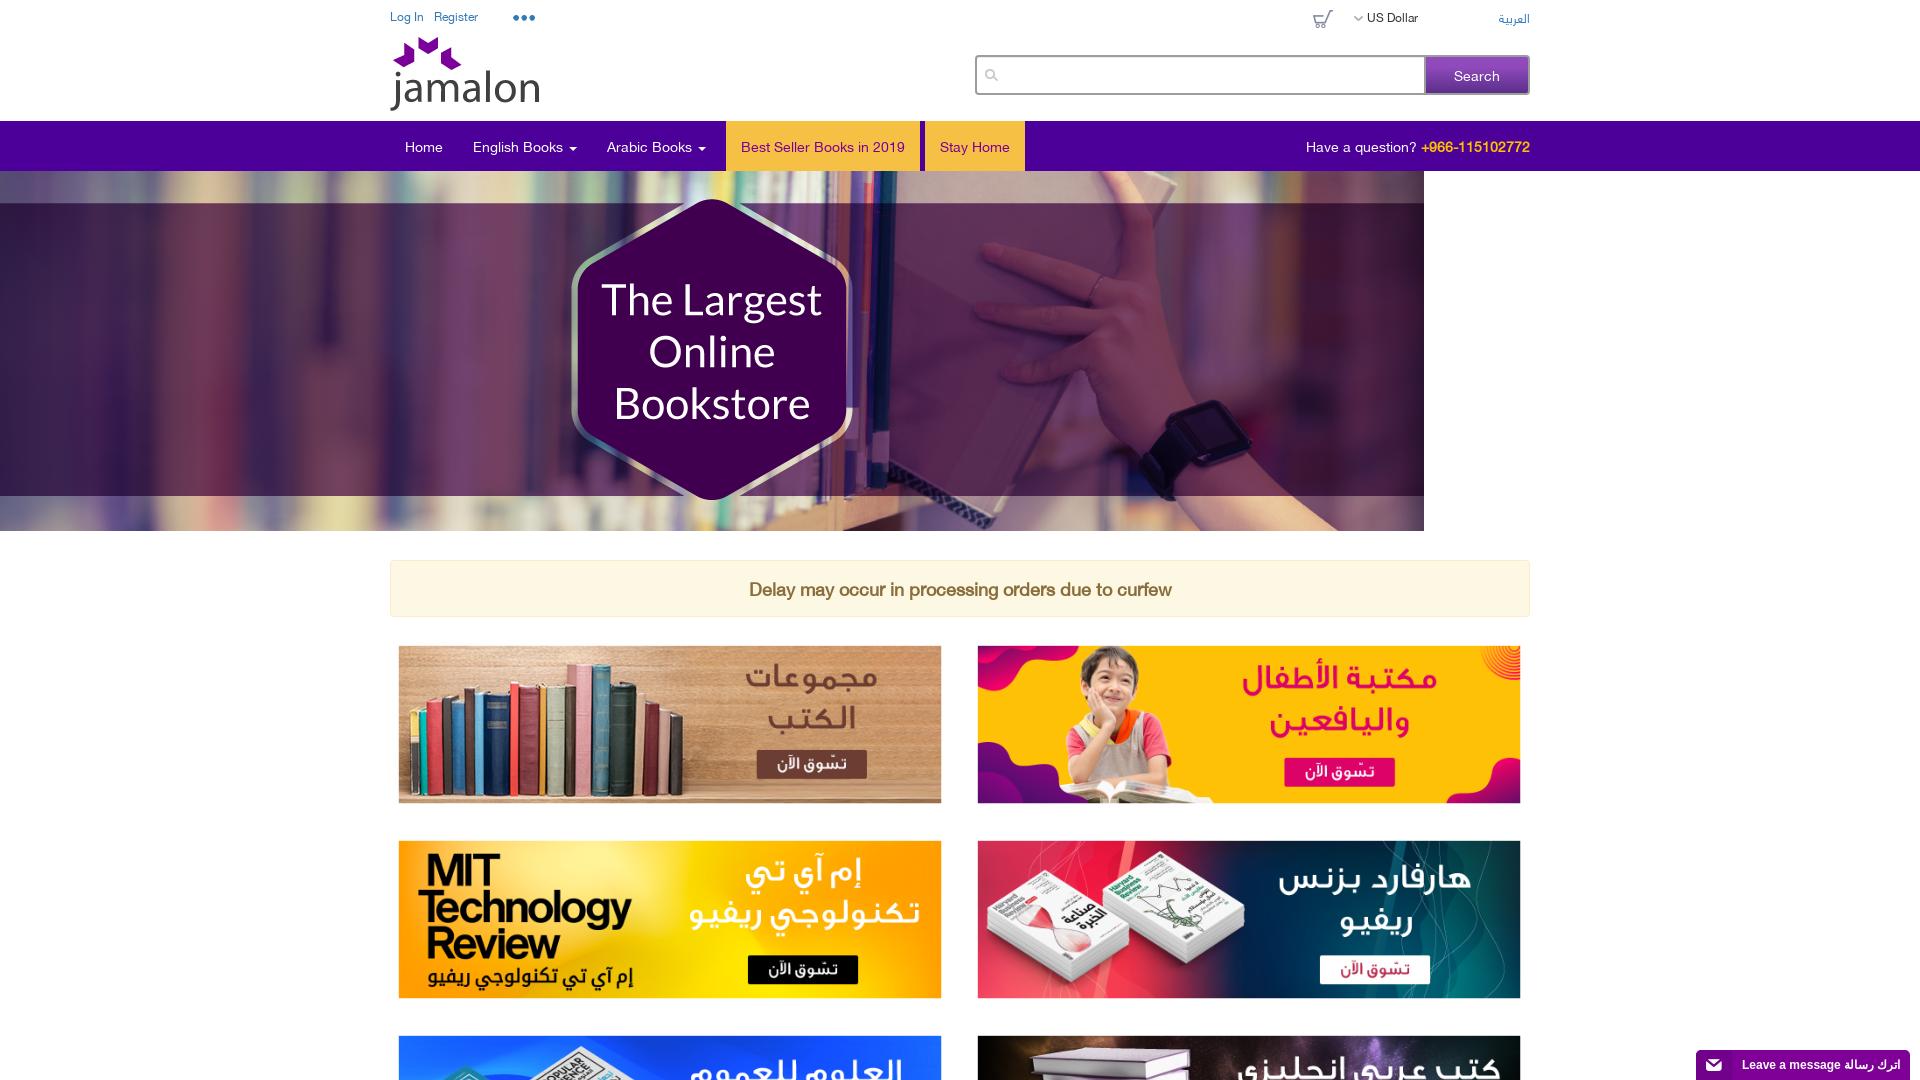 Jamalon website